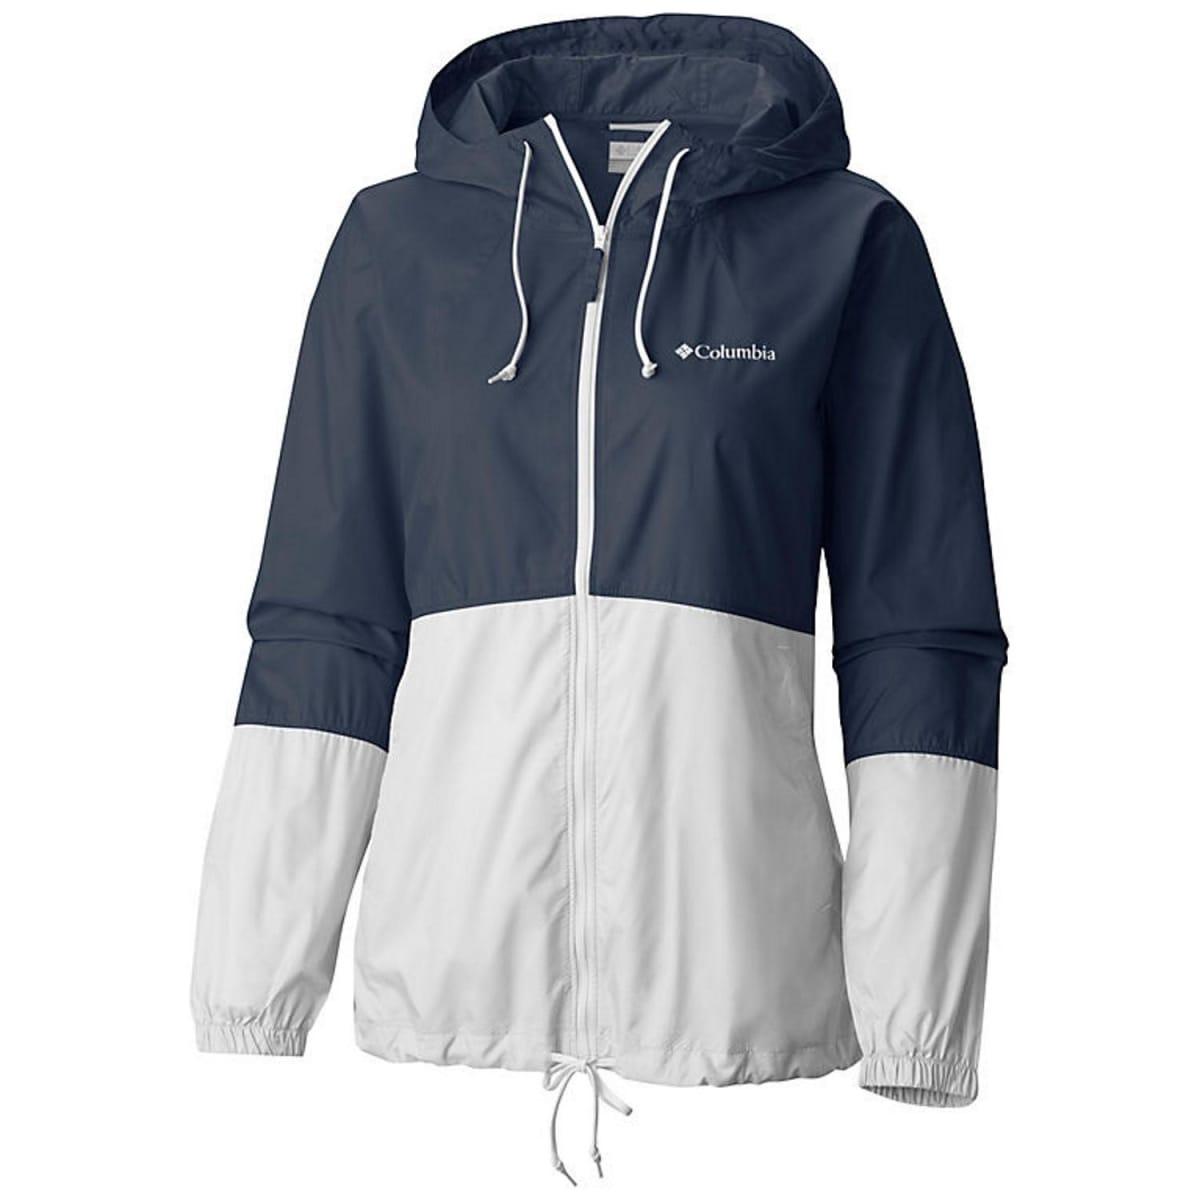 99176afffb Product Image. Columbia Ladies Flashforward Jacket